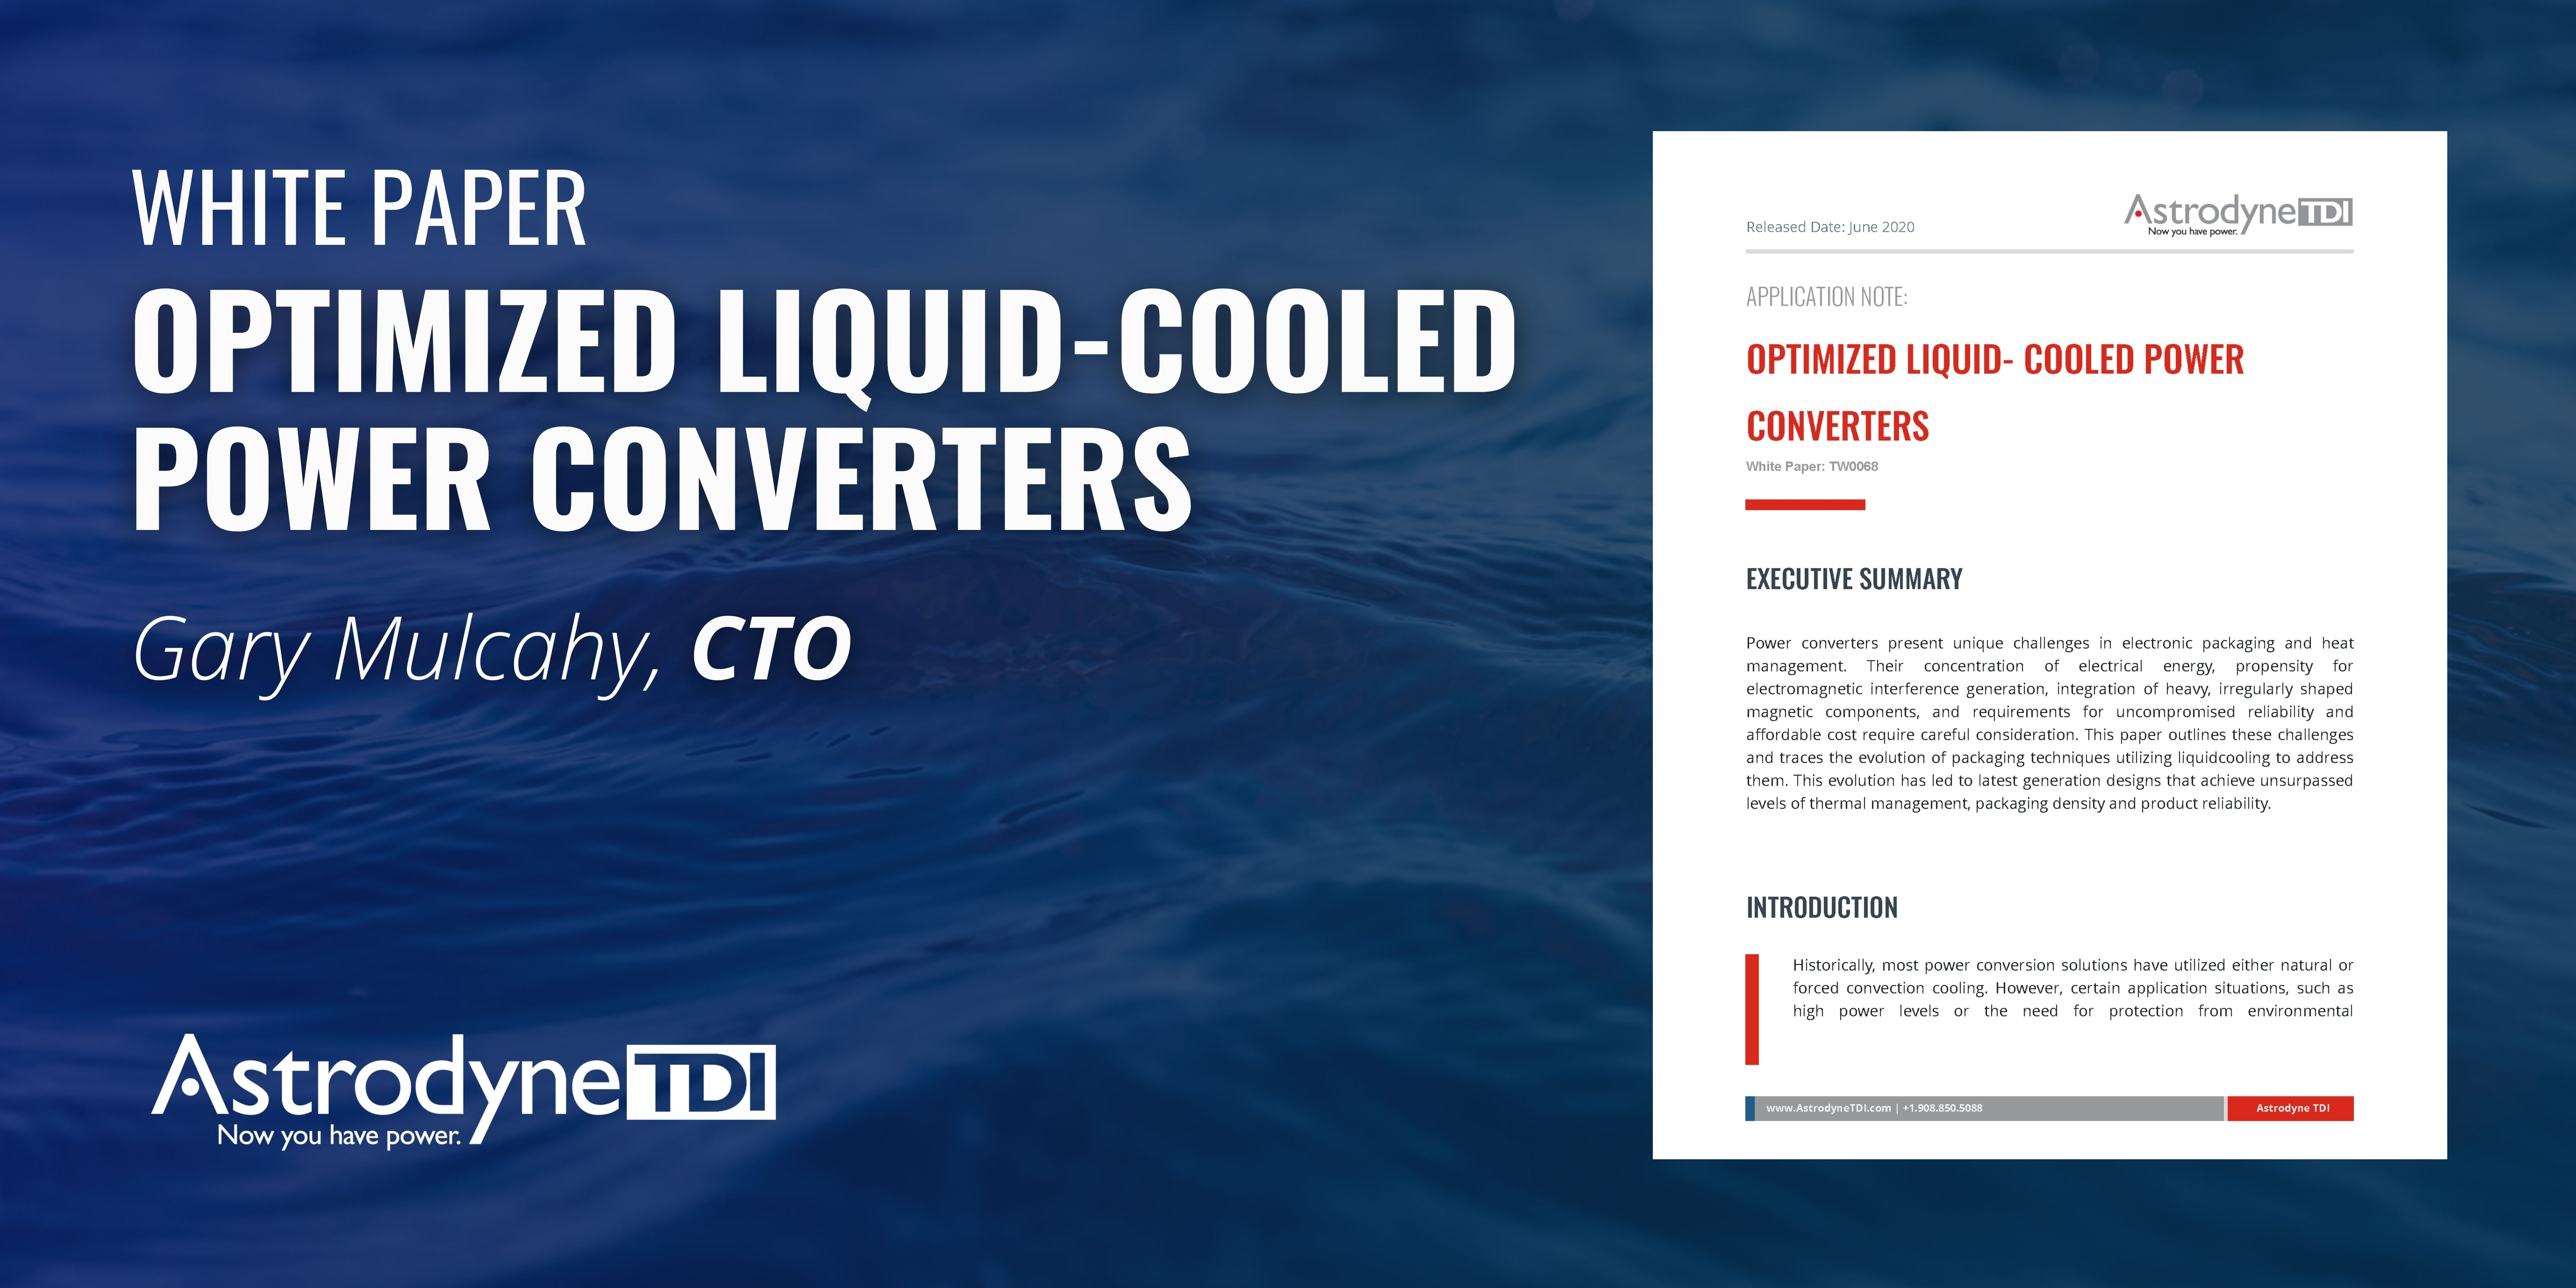 Optimized Liquid-Cooled Power Converters